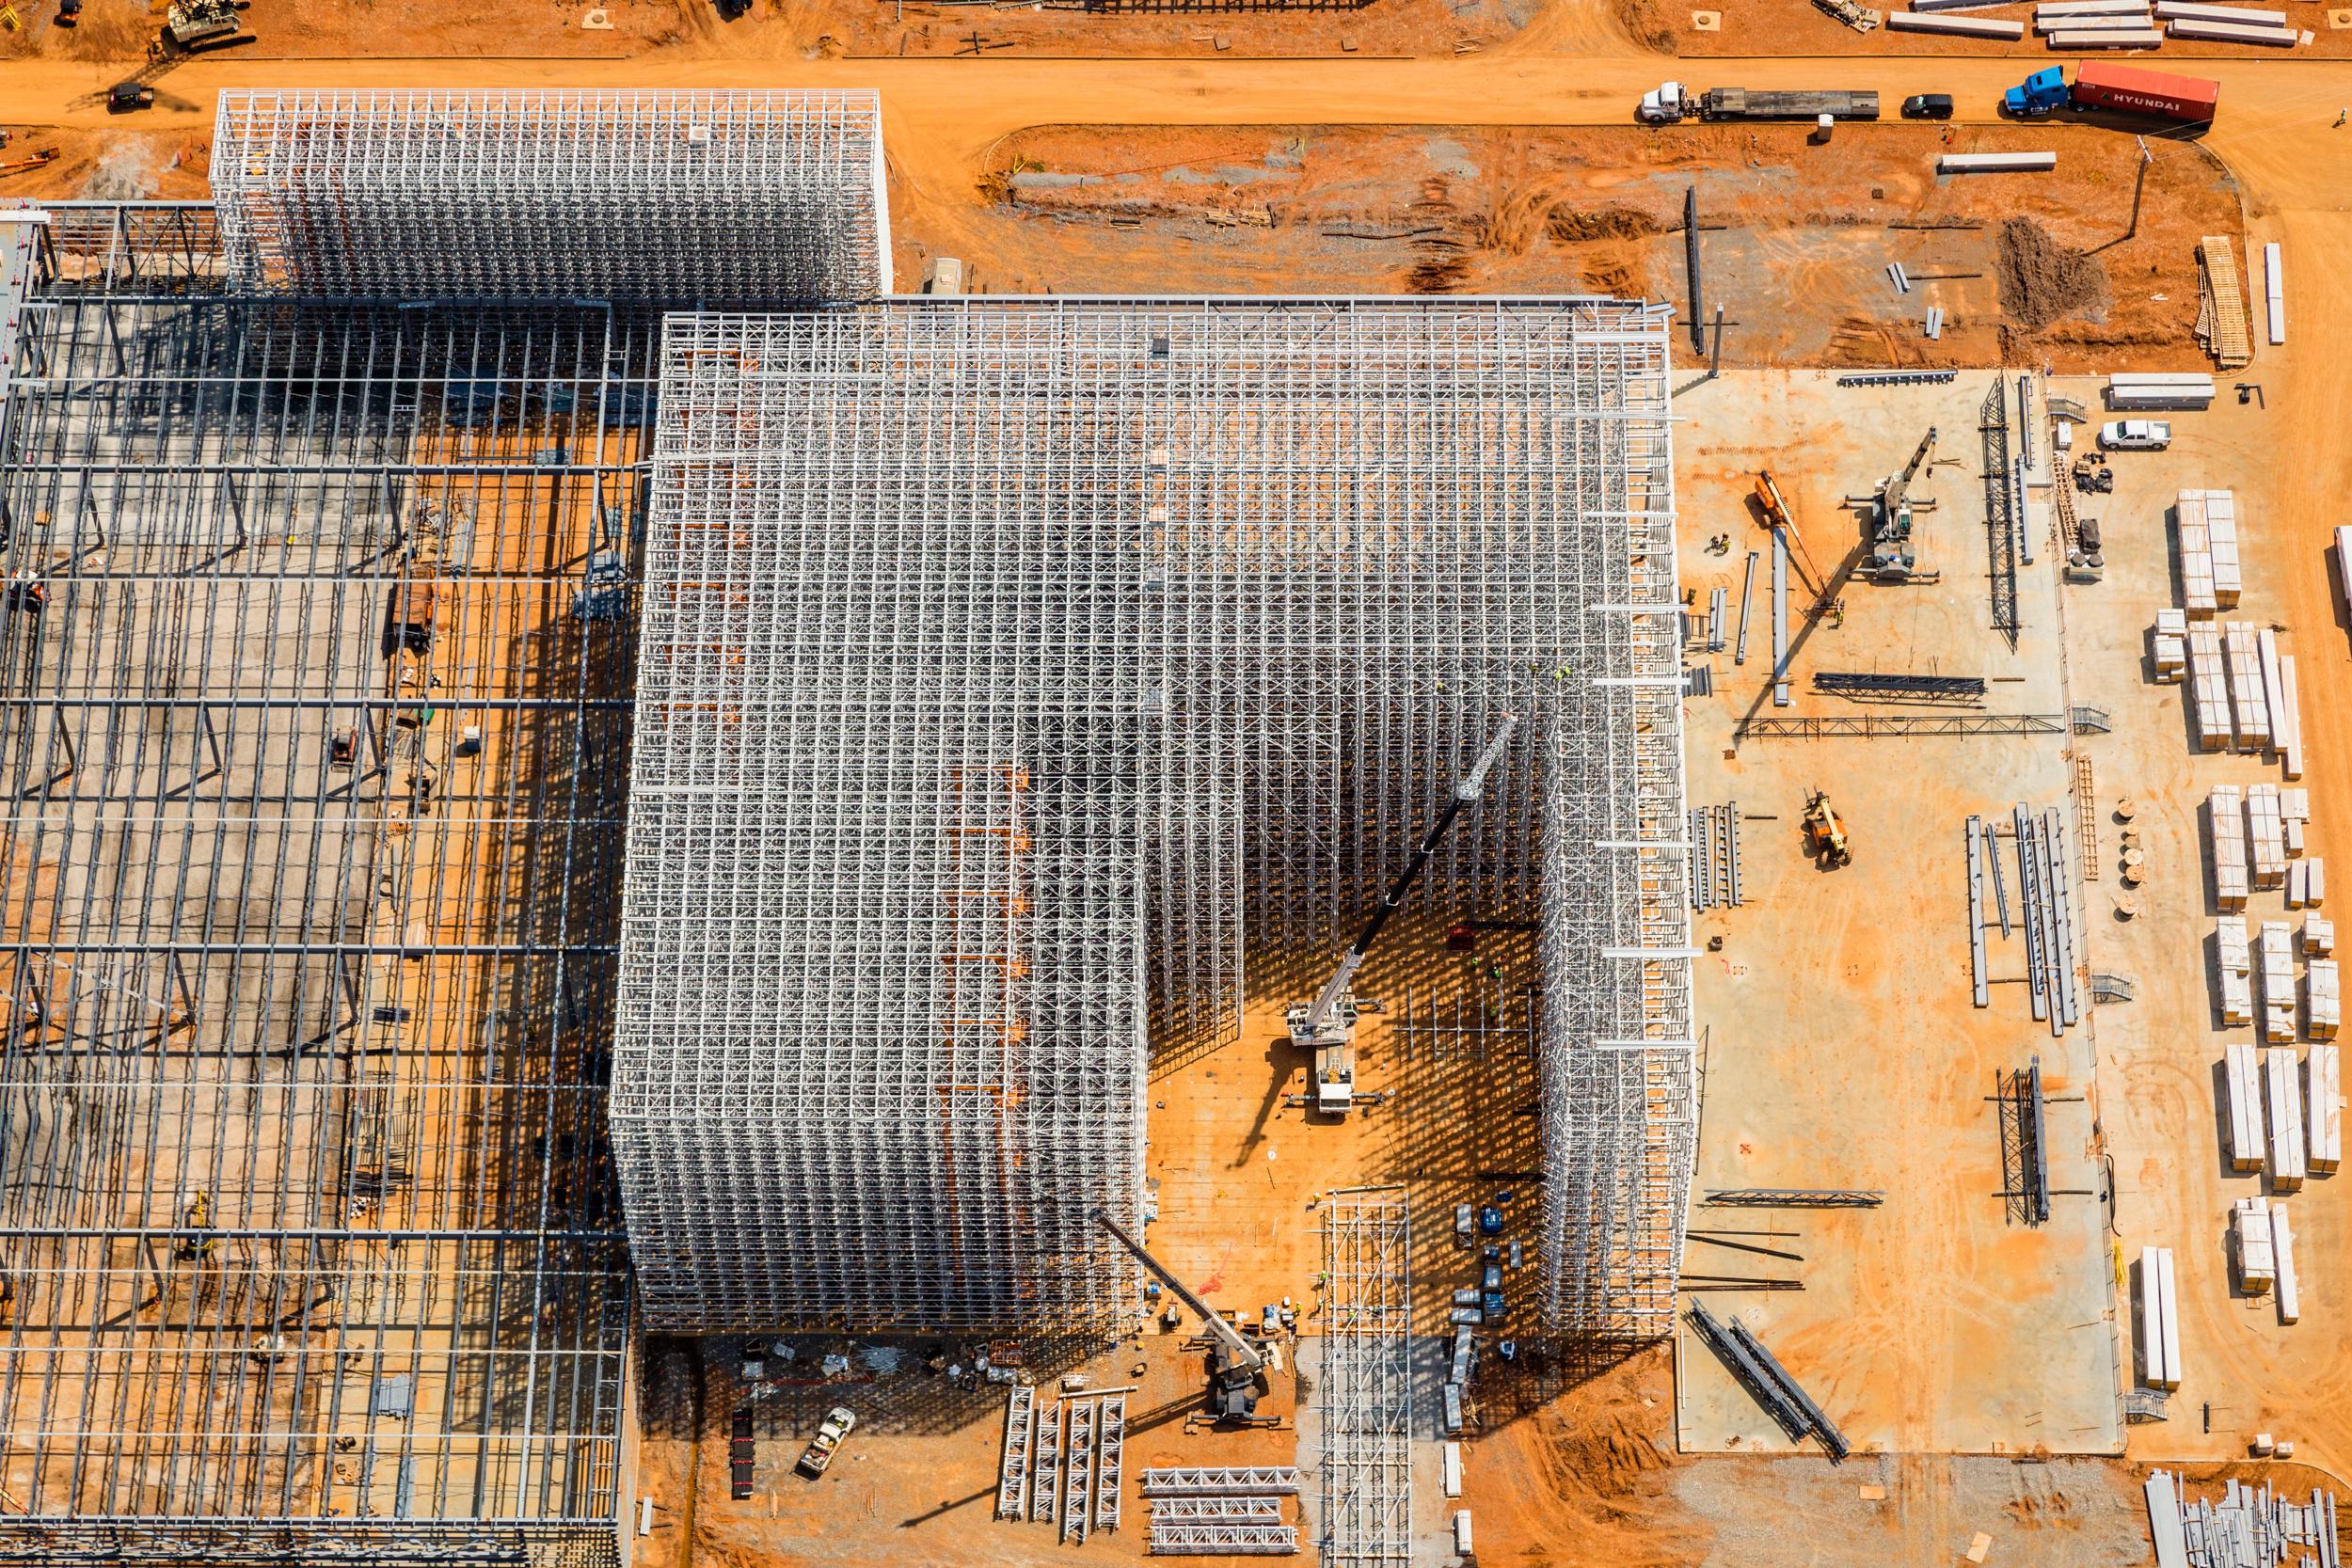 RSmith_Construction-0734_2500.jpg